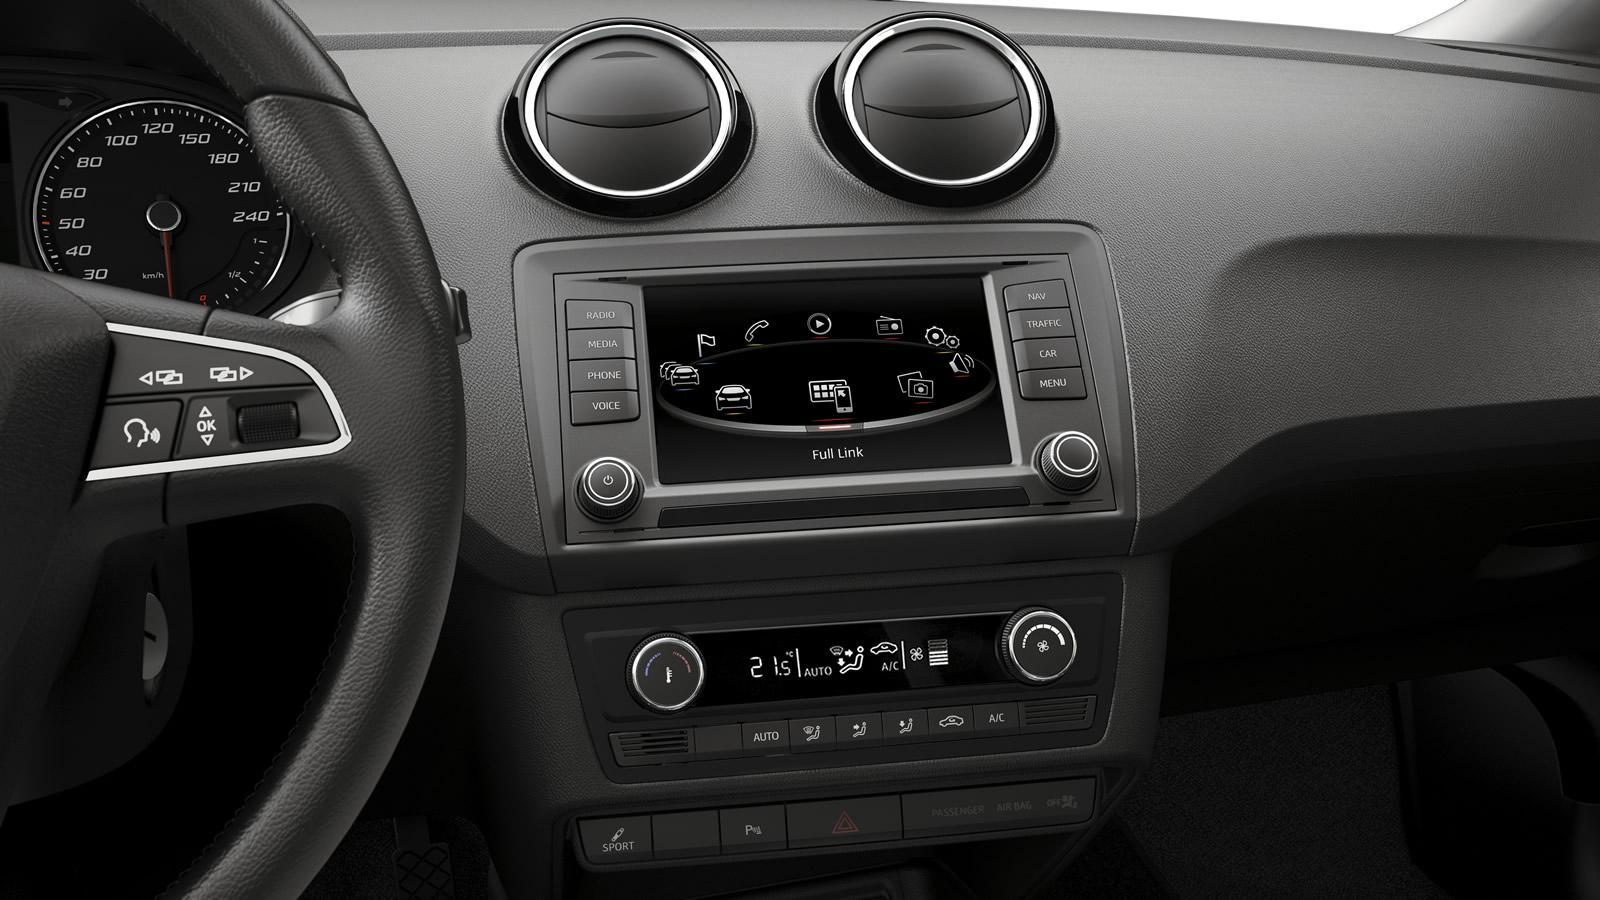 2015 SEAT Ibiza Facelift Gets Leon Interior Bits, Minor Cosmetic ...